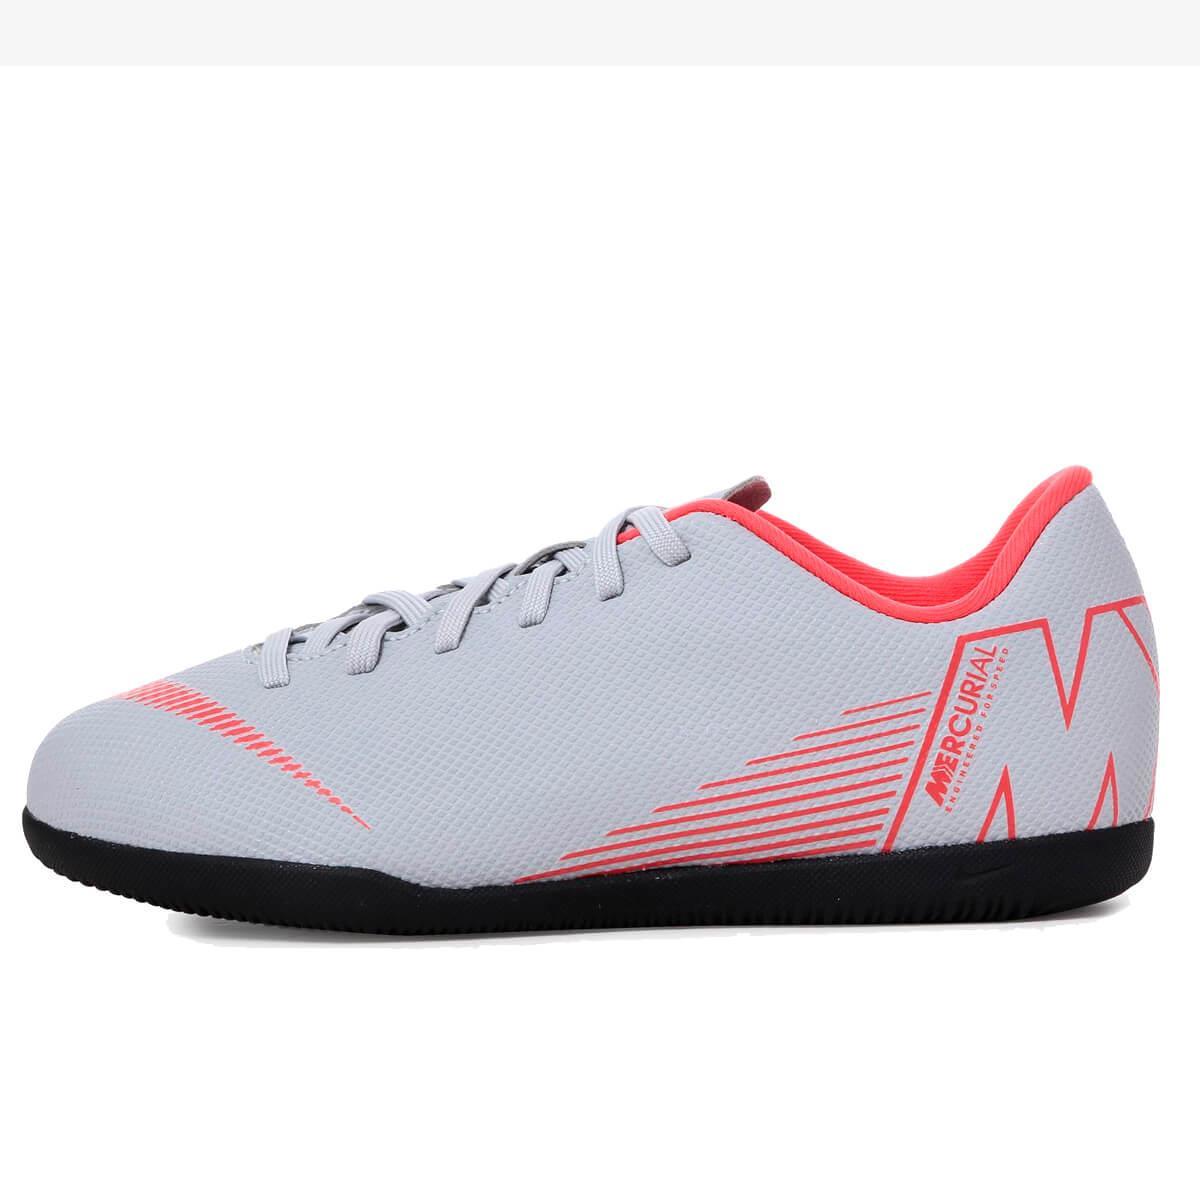 49126f99ab Chuteira Futsal Nike MercurialX Vapor XII Club Infantil